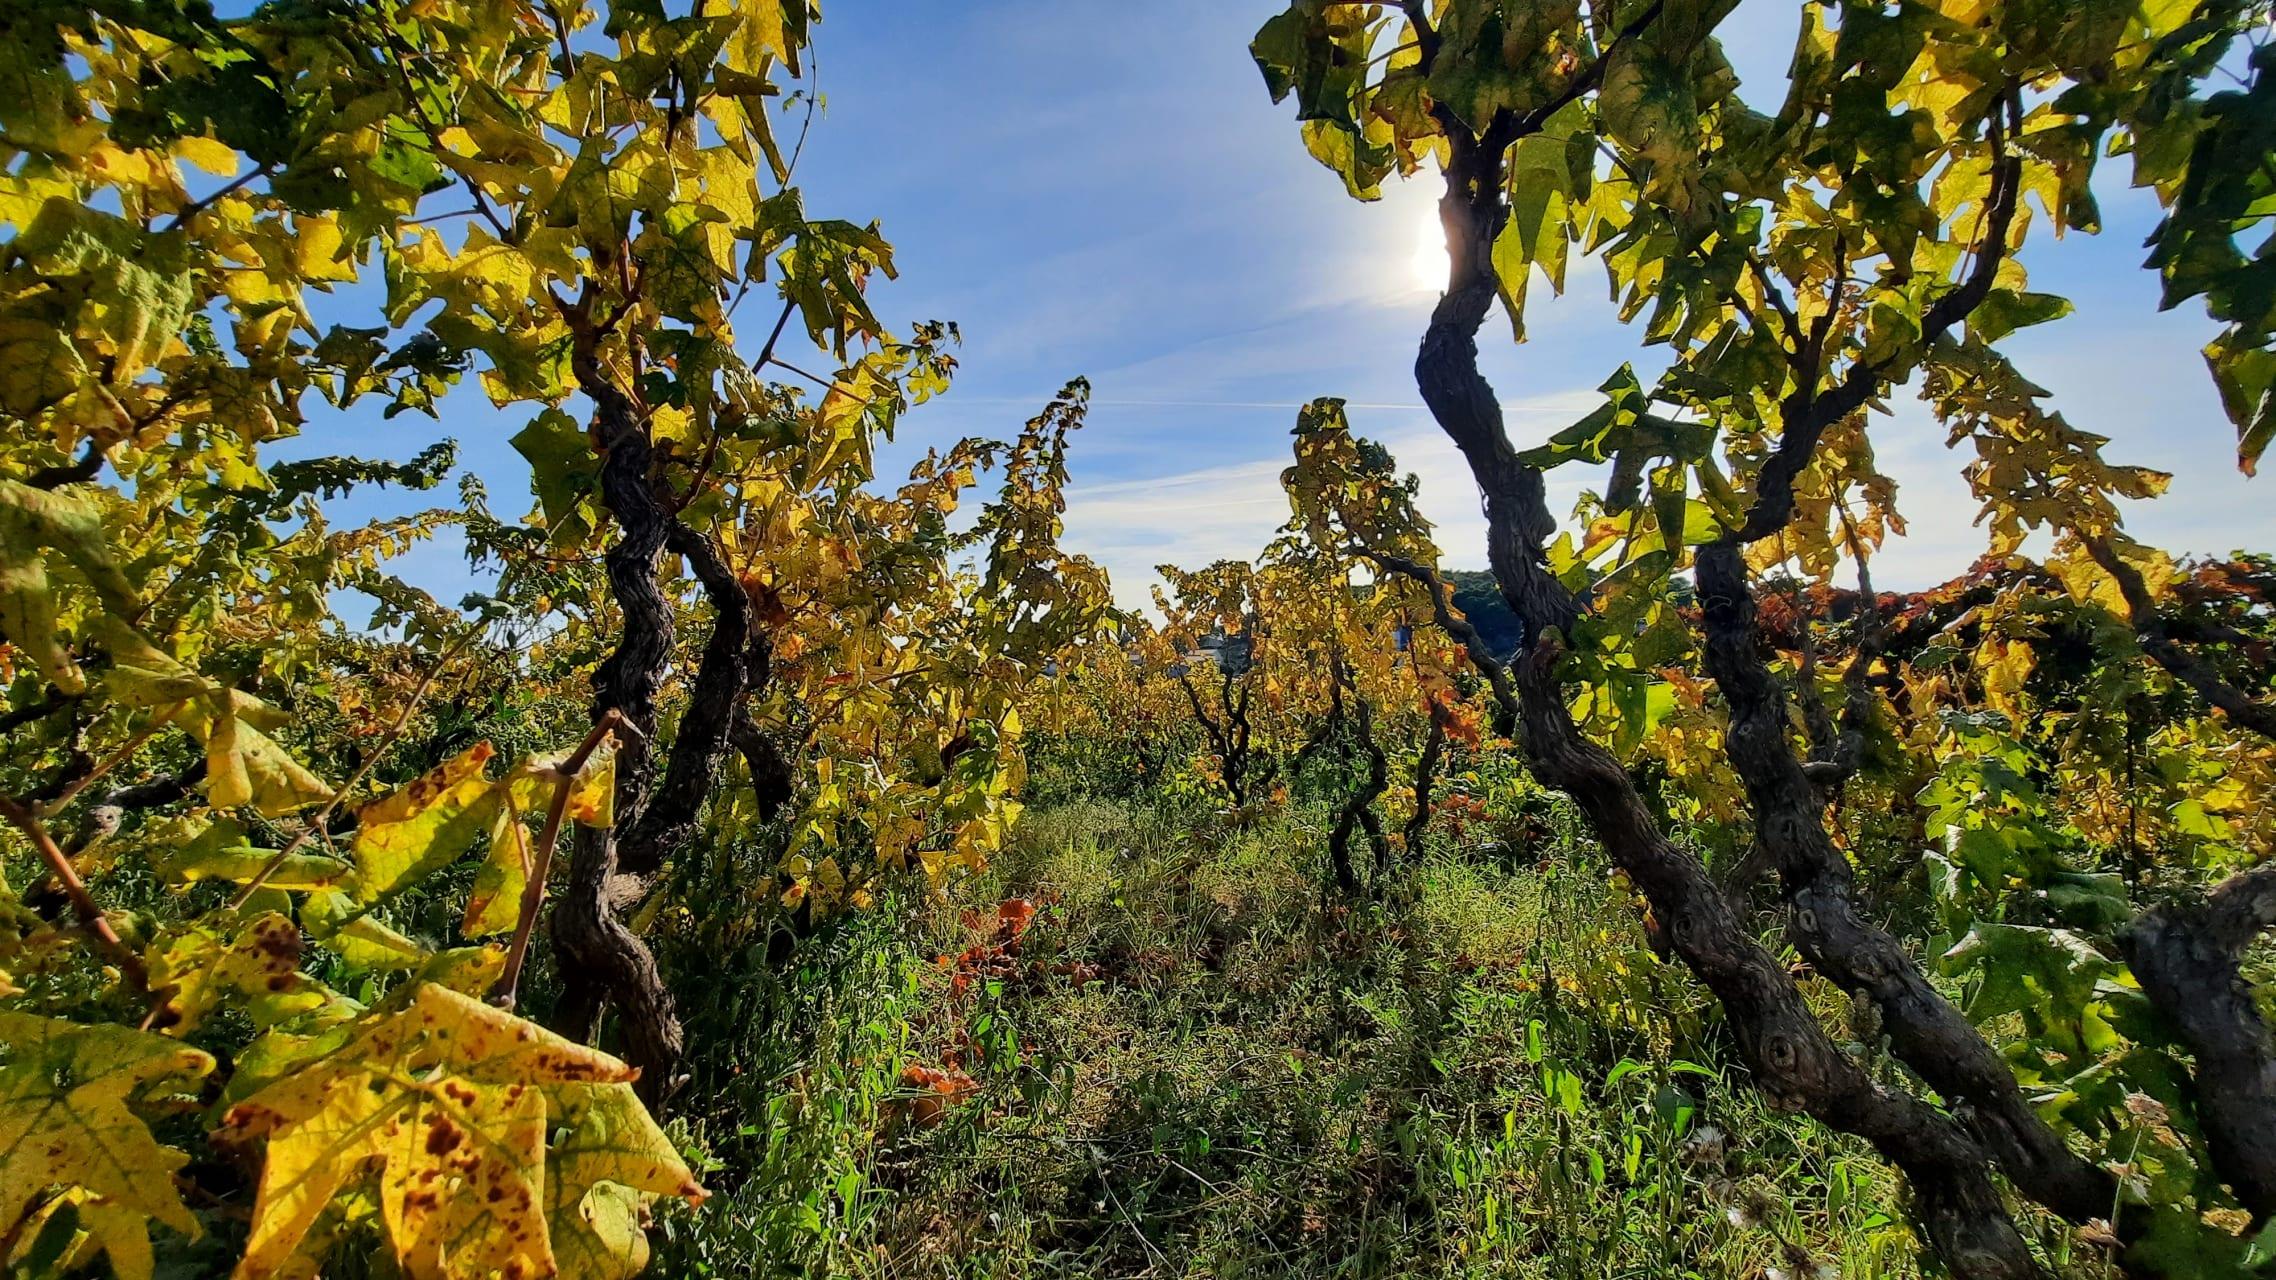 Korcula -  Relaxing Walk in the Autumn Vineyards of Lumbarda